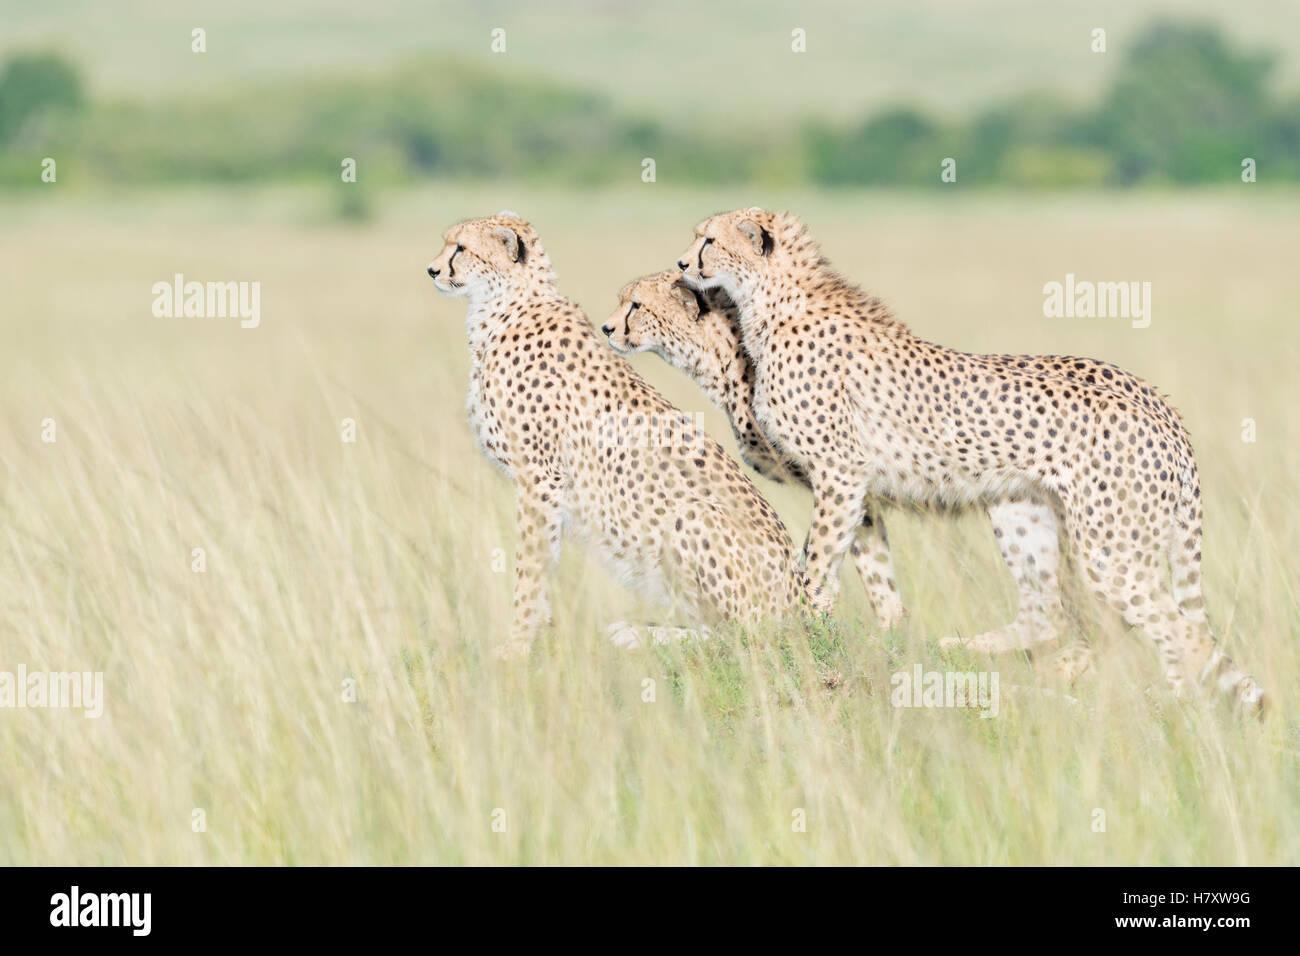 Drei Cheetah (Acinonix Jubatus) stehen auf der Suche in Savanne, Masai Mara National Reserve, Kenia Stockbild